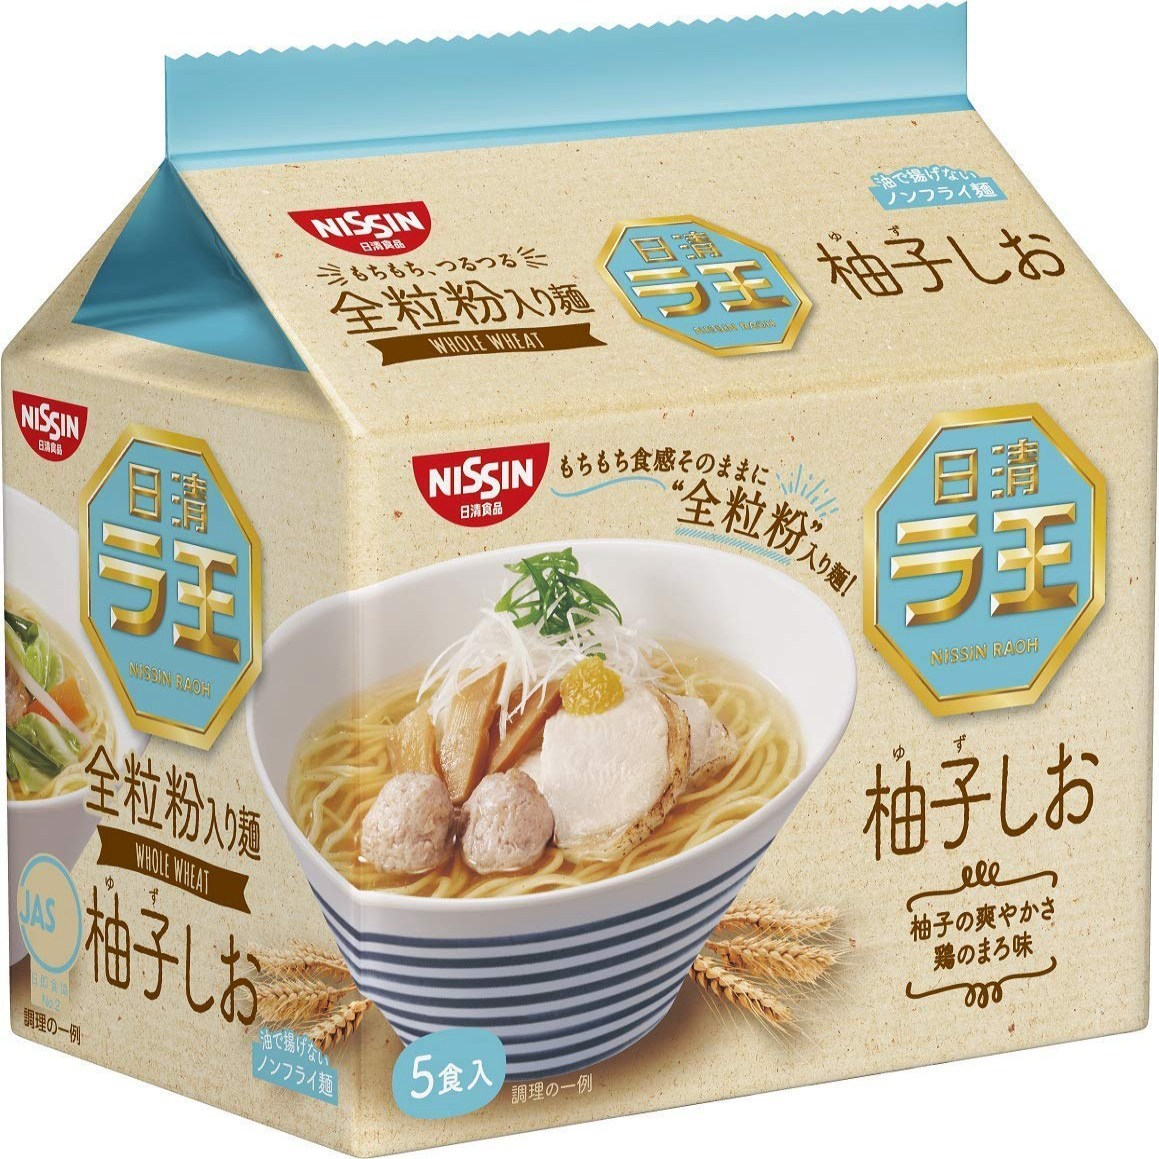 Nissin - Raoh Japanese Instant Ramen Yuzu Salt Soup Noodles (For 5 Servings) Nissin-Raoh 일본식 인스턴트라면, 1